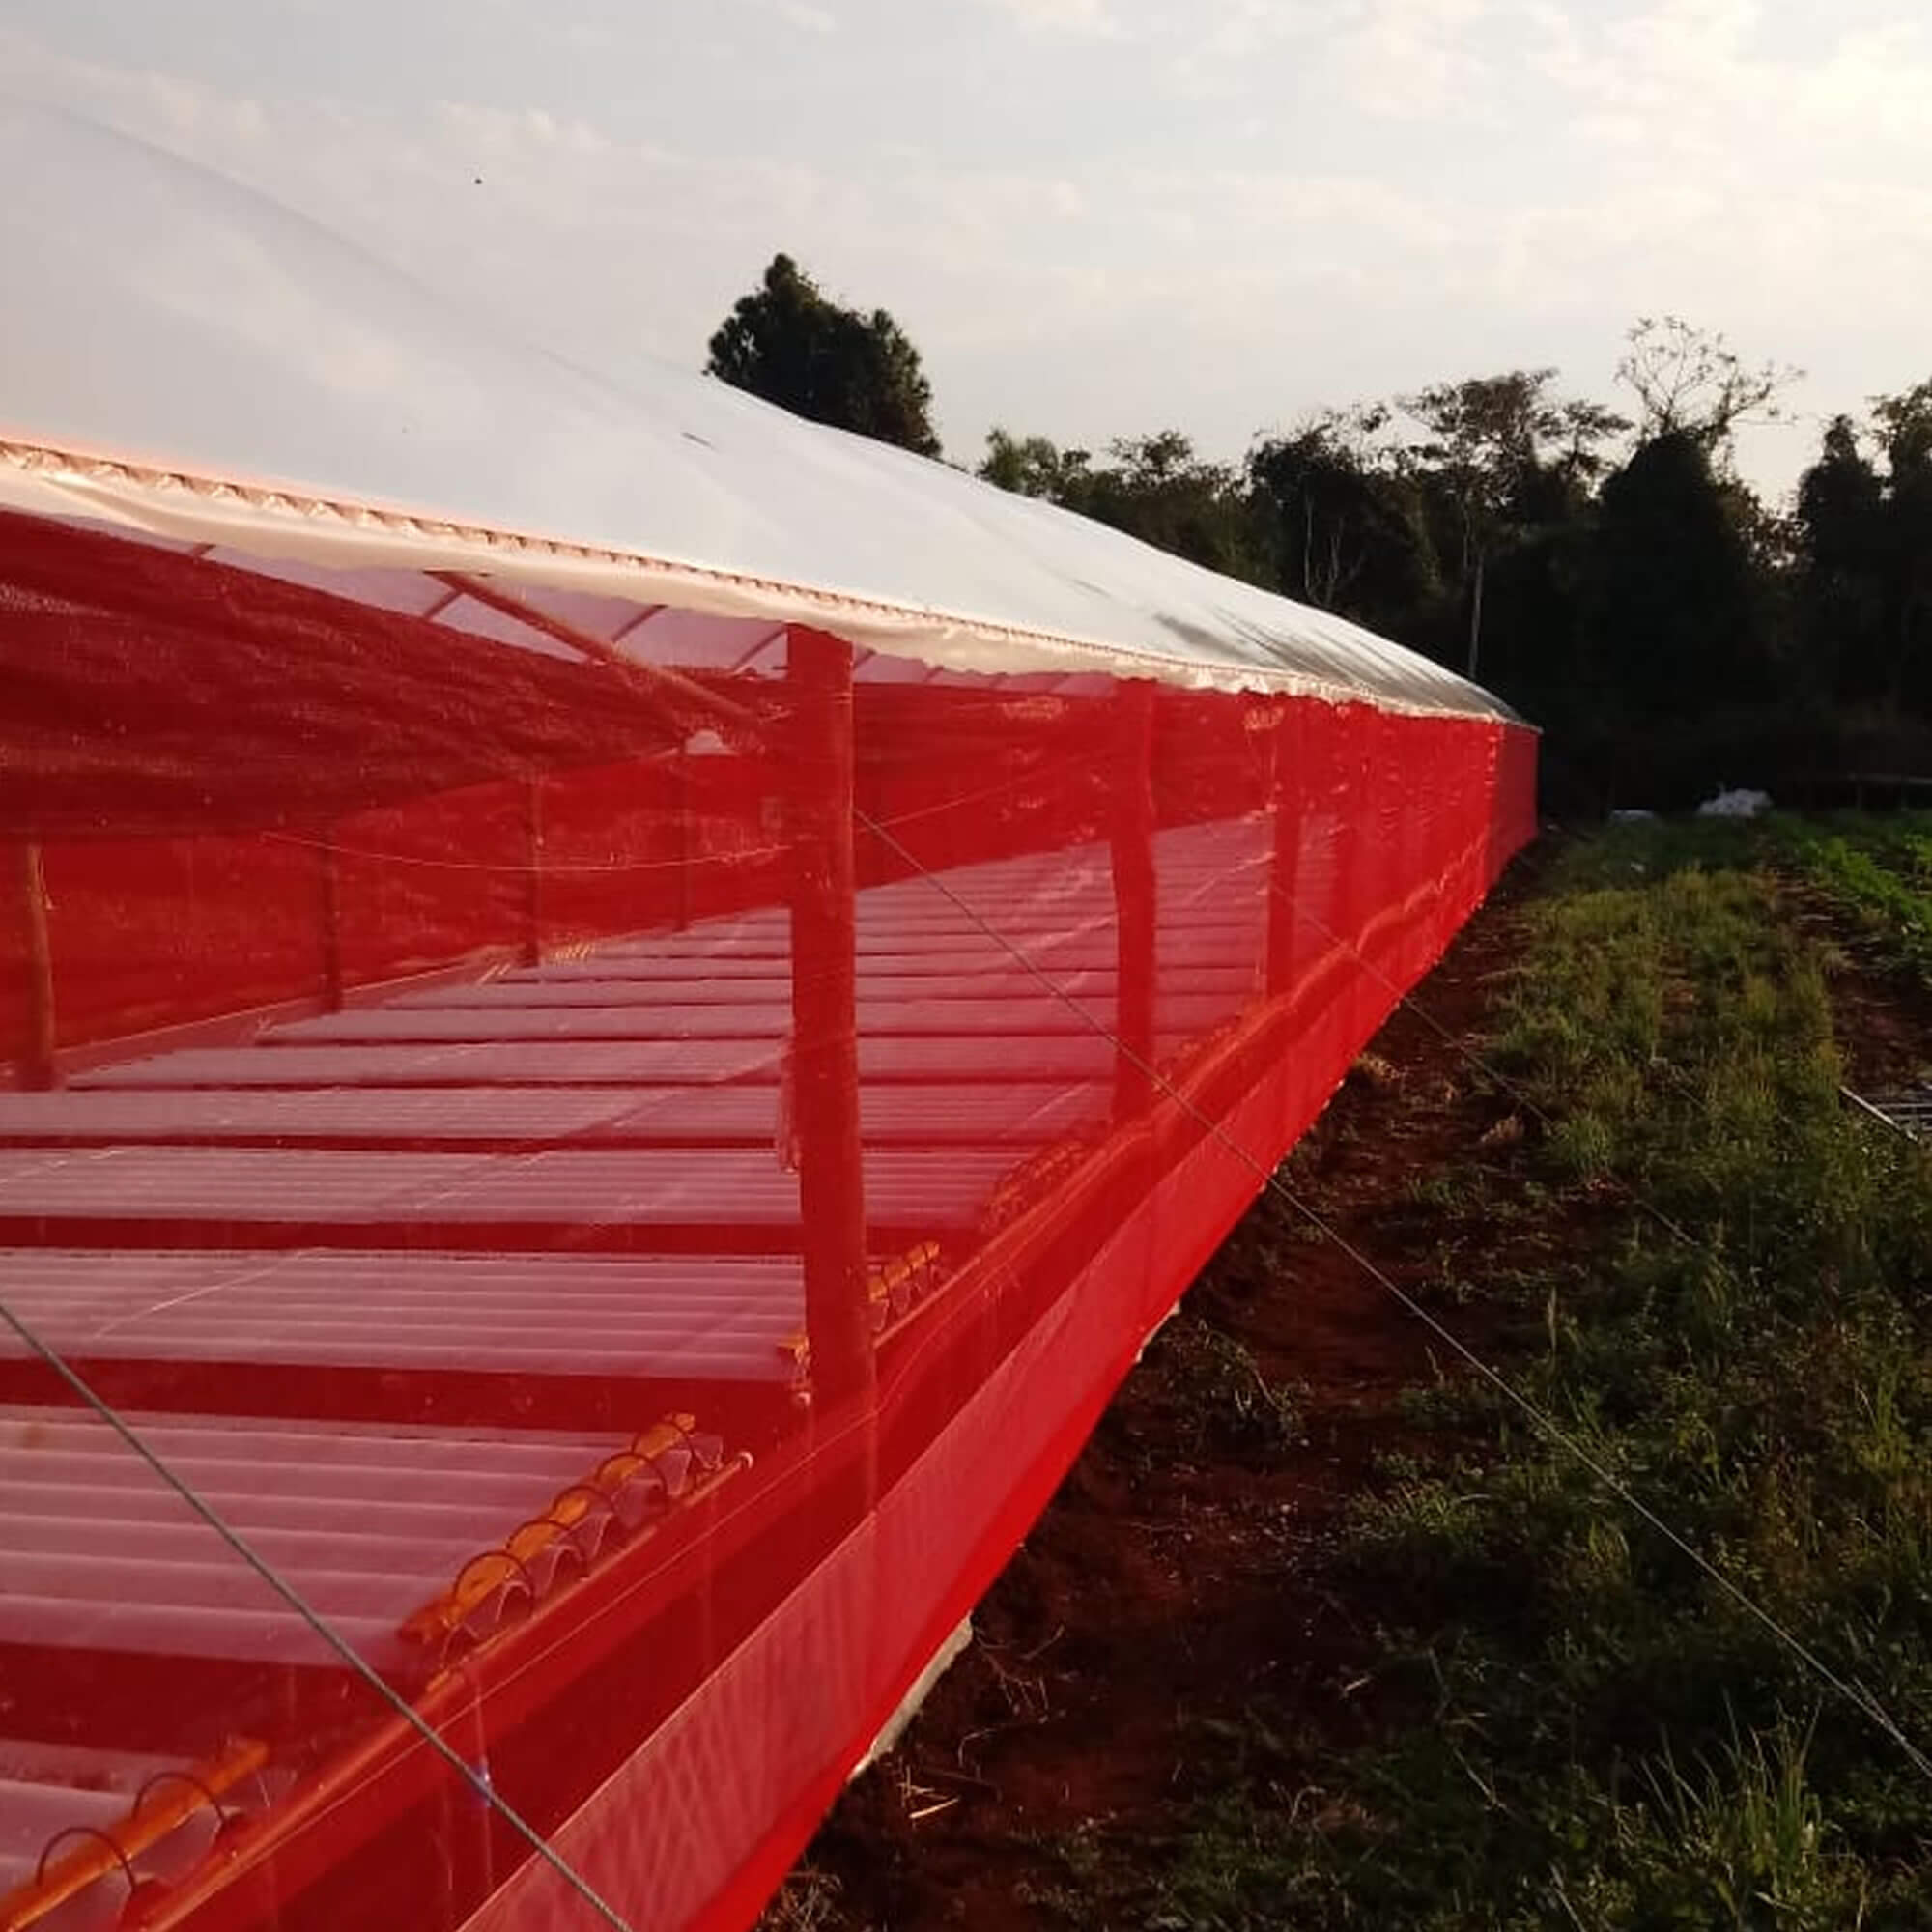 Tela de Sombreamento Vermelha 20% - 4,15 x 10 metros